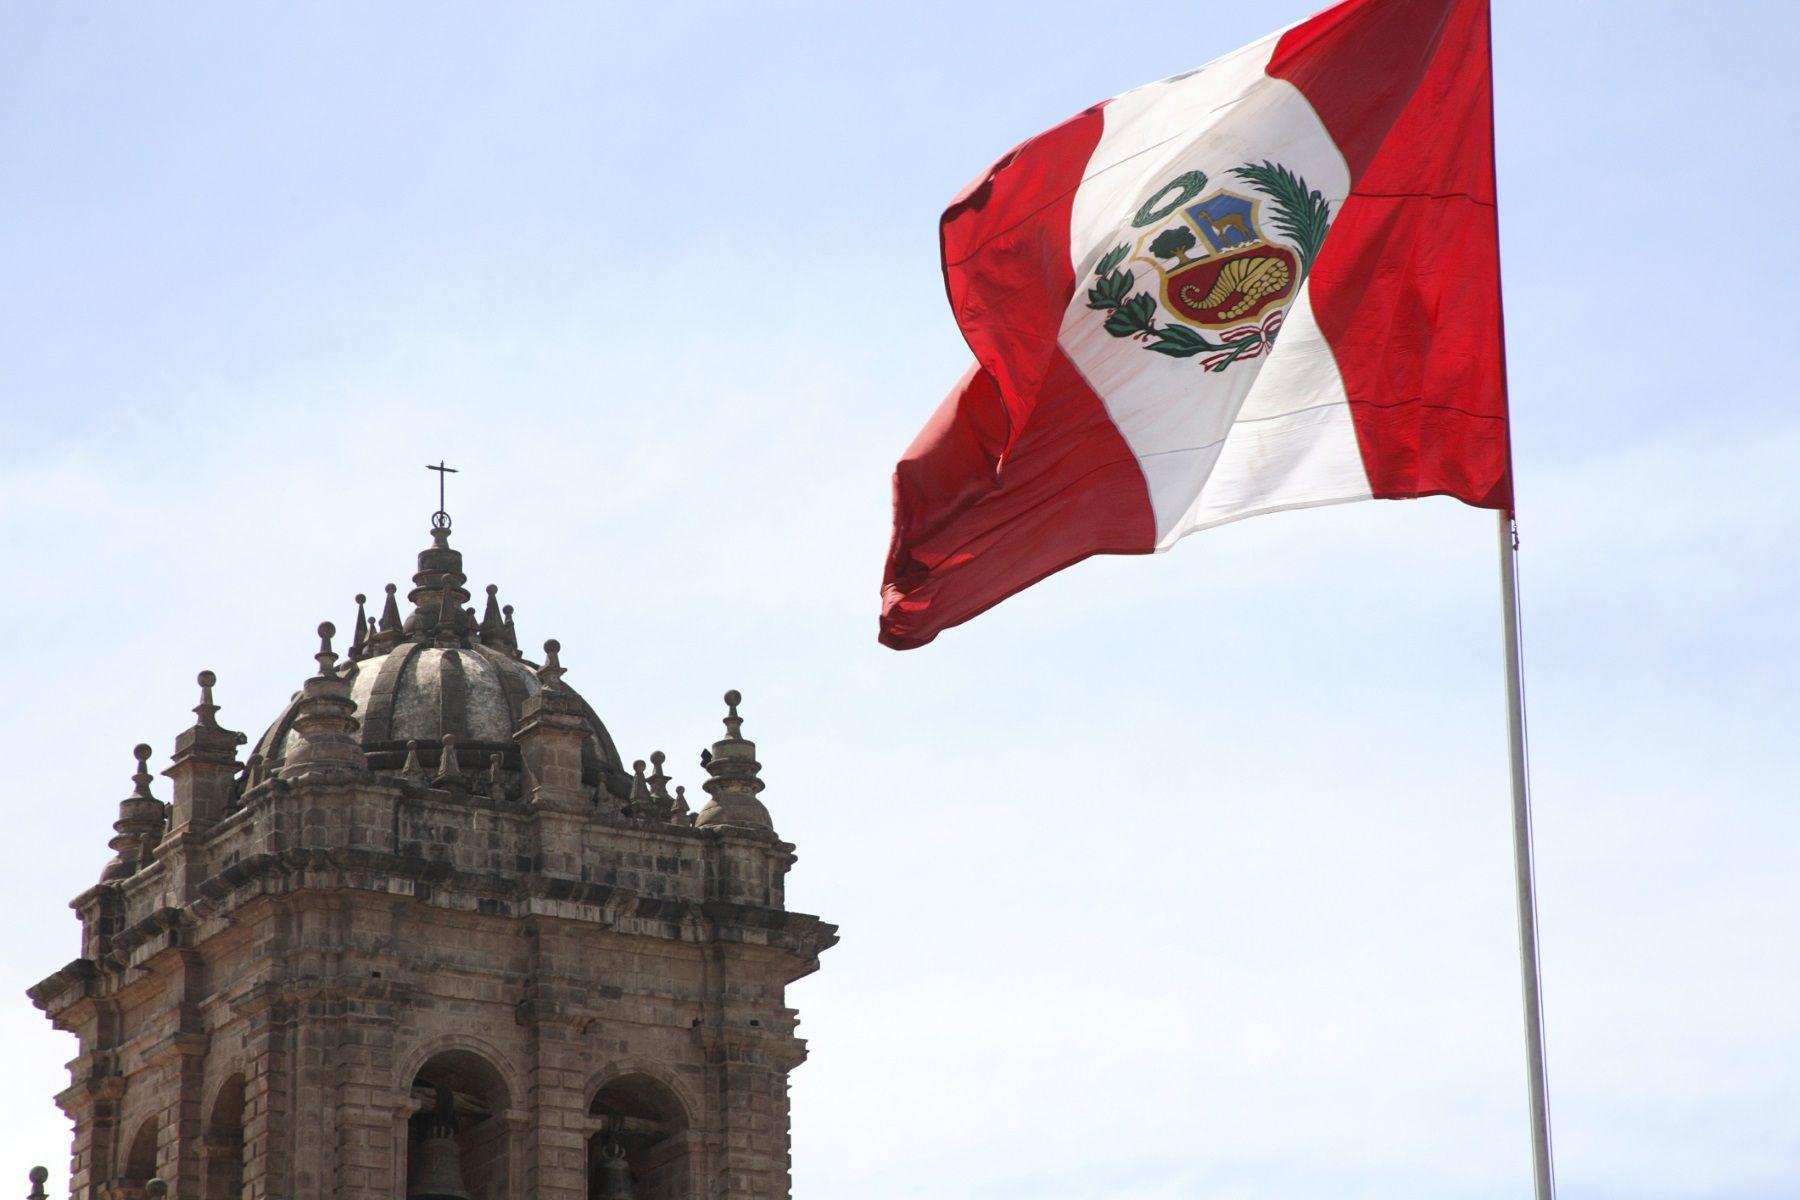 Bureaucracy drags on Peru flooding reconstruction